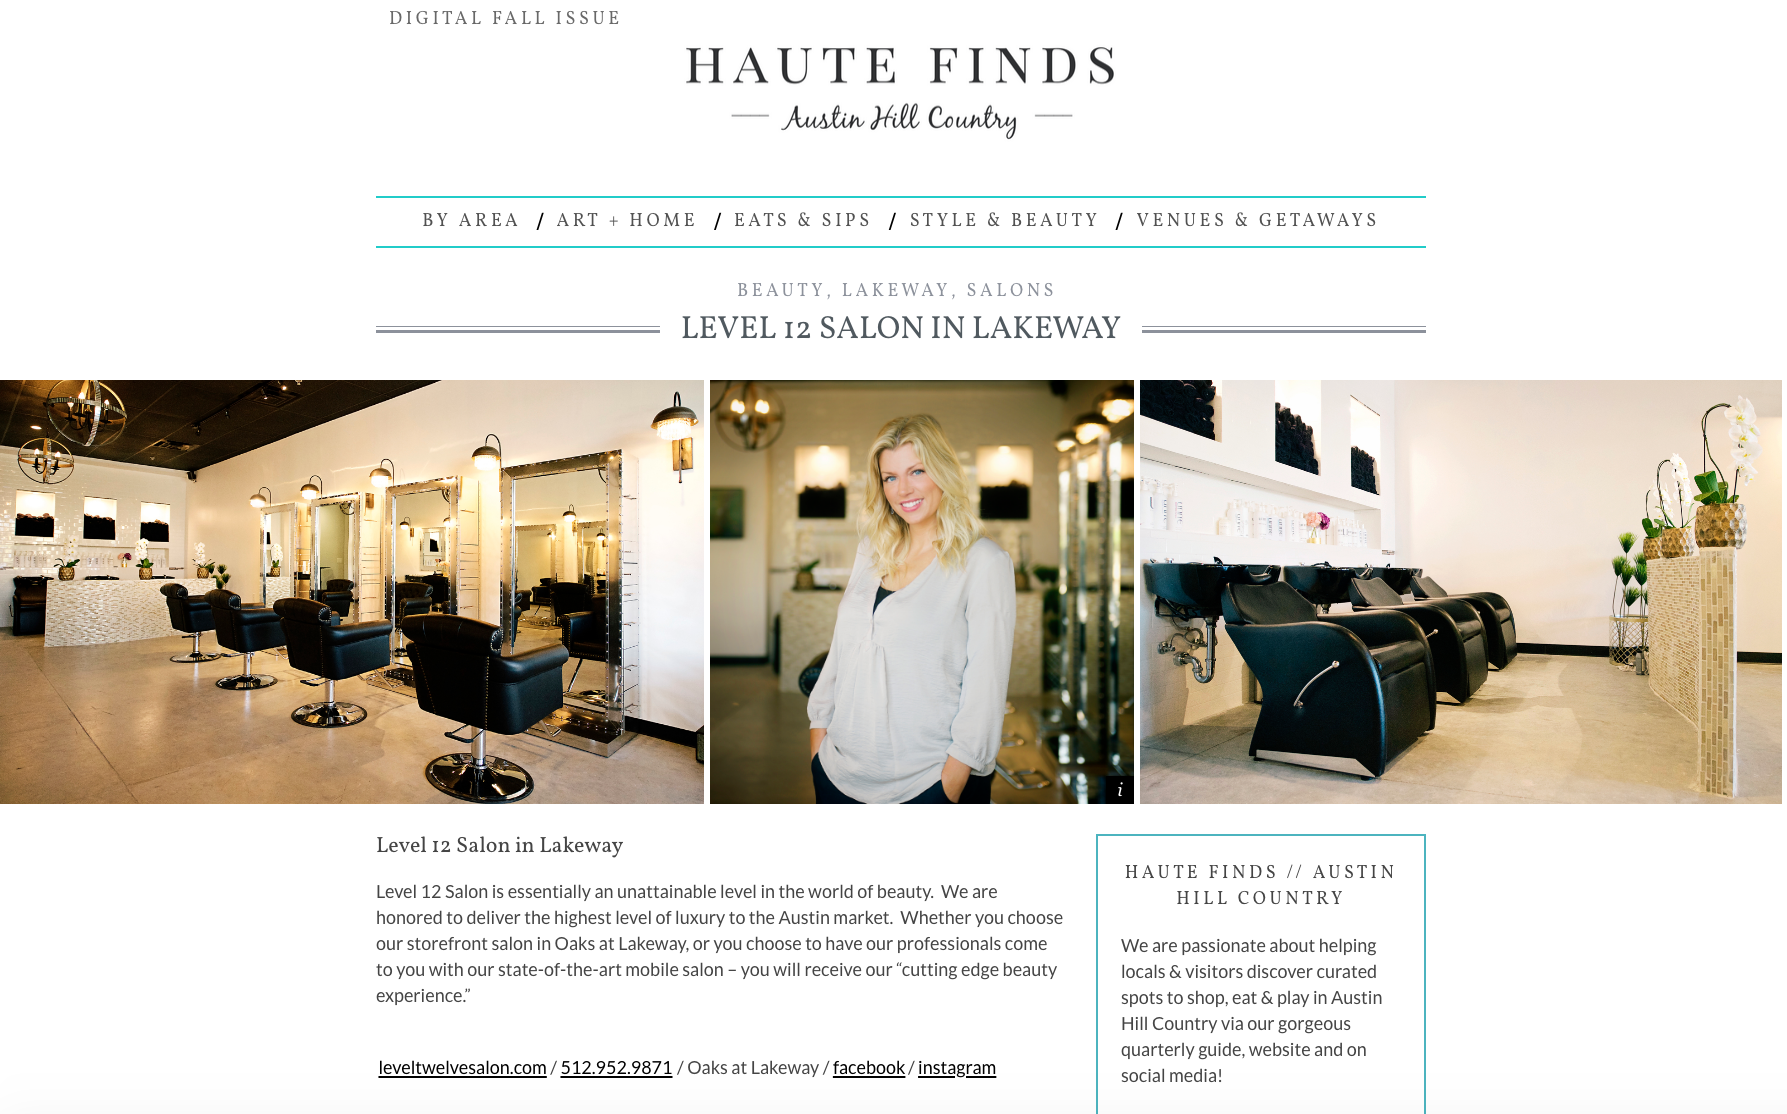 Haute Finds Feature - Level 12 Salon